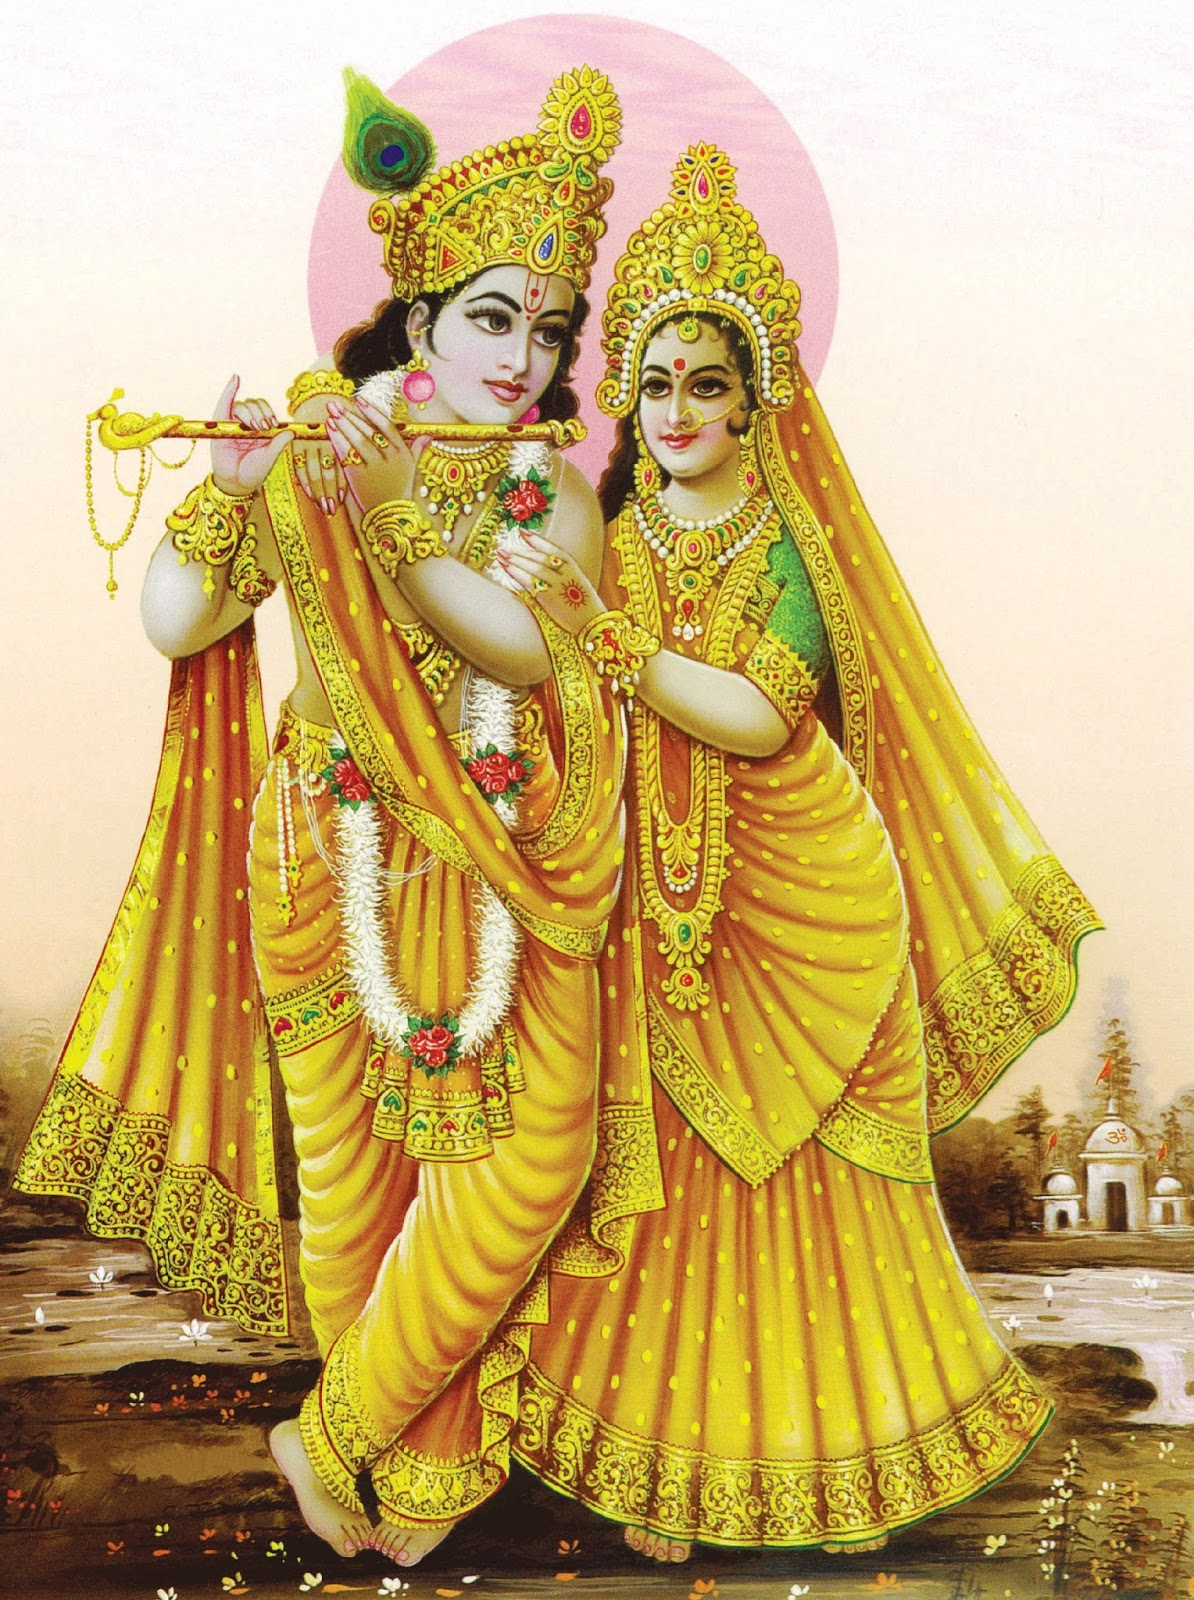 radha-krishna.jpg (1194×1600) - Radha Krishna PNG